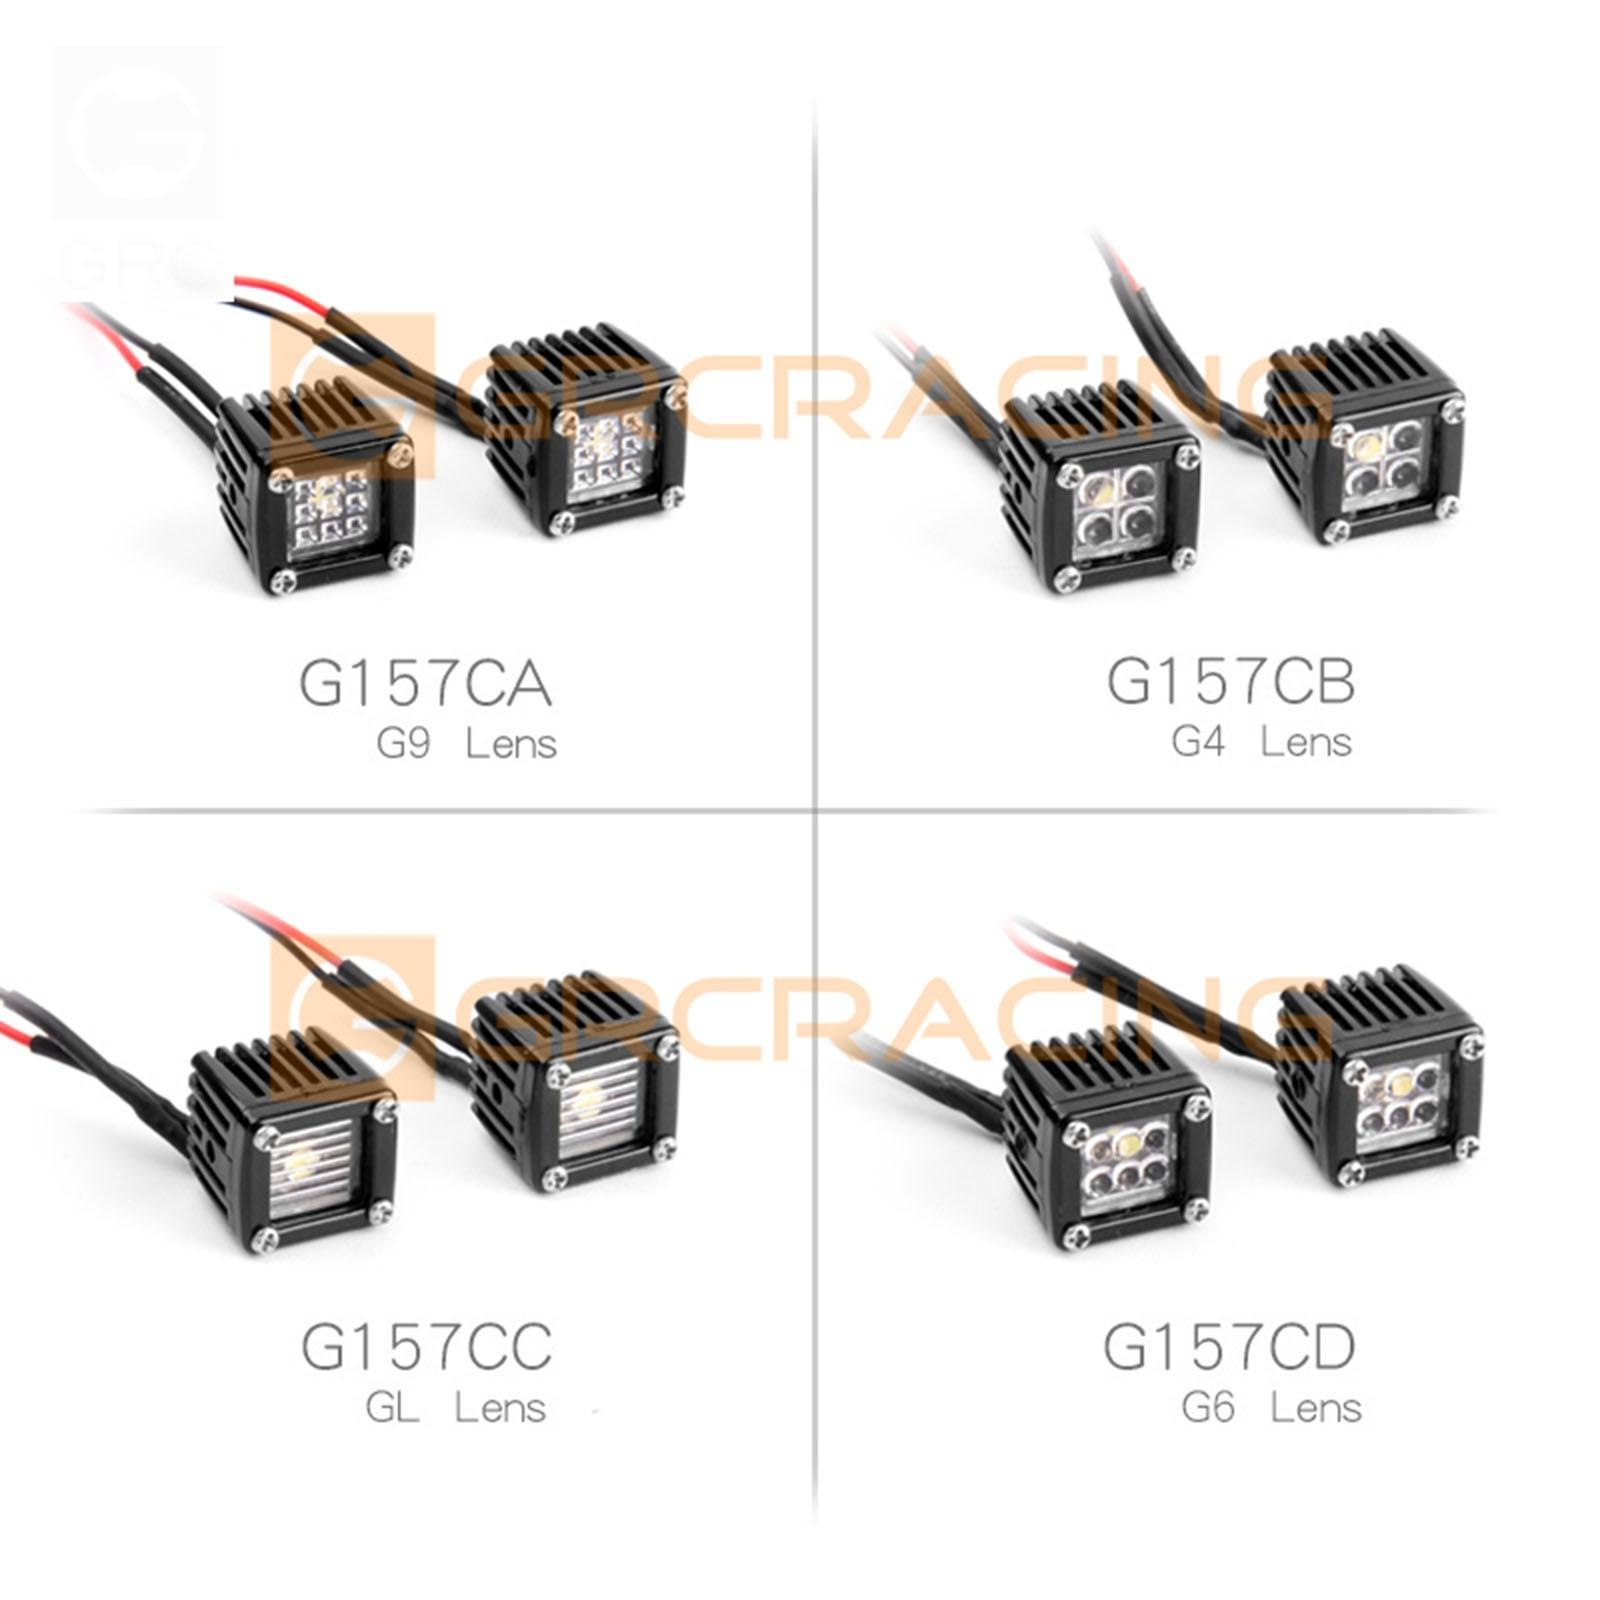 RC Car LED Light Headlights Spotlight for 1/10 RC Crawler Axial SCX10 III AXI03007 90046 Traxxas TRX4 Redcat Gen8 Tamiya